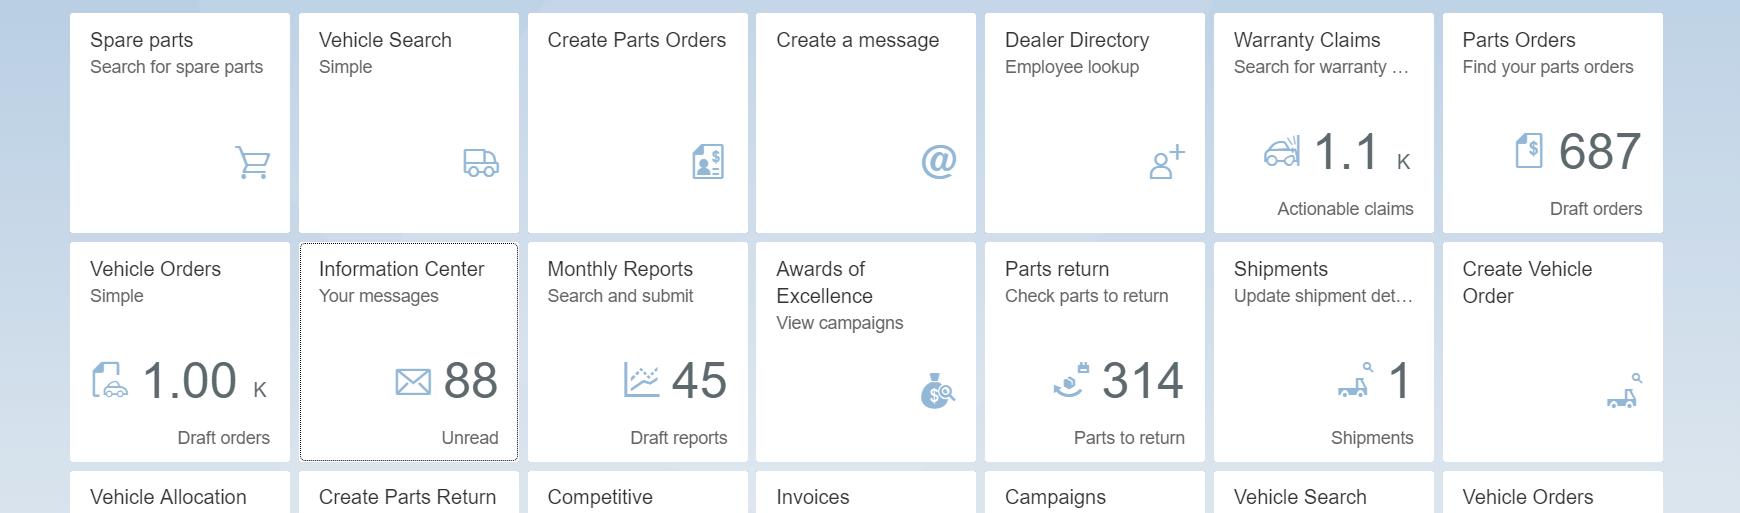 Dealer Portal - Information Center